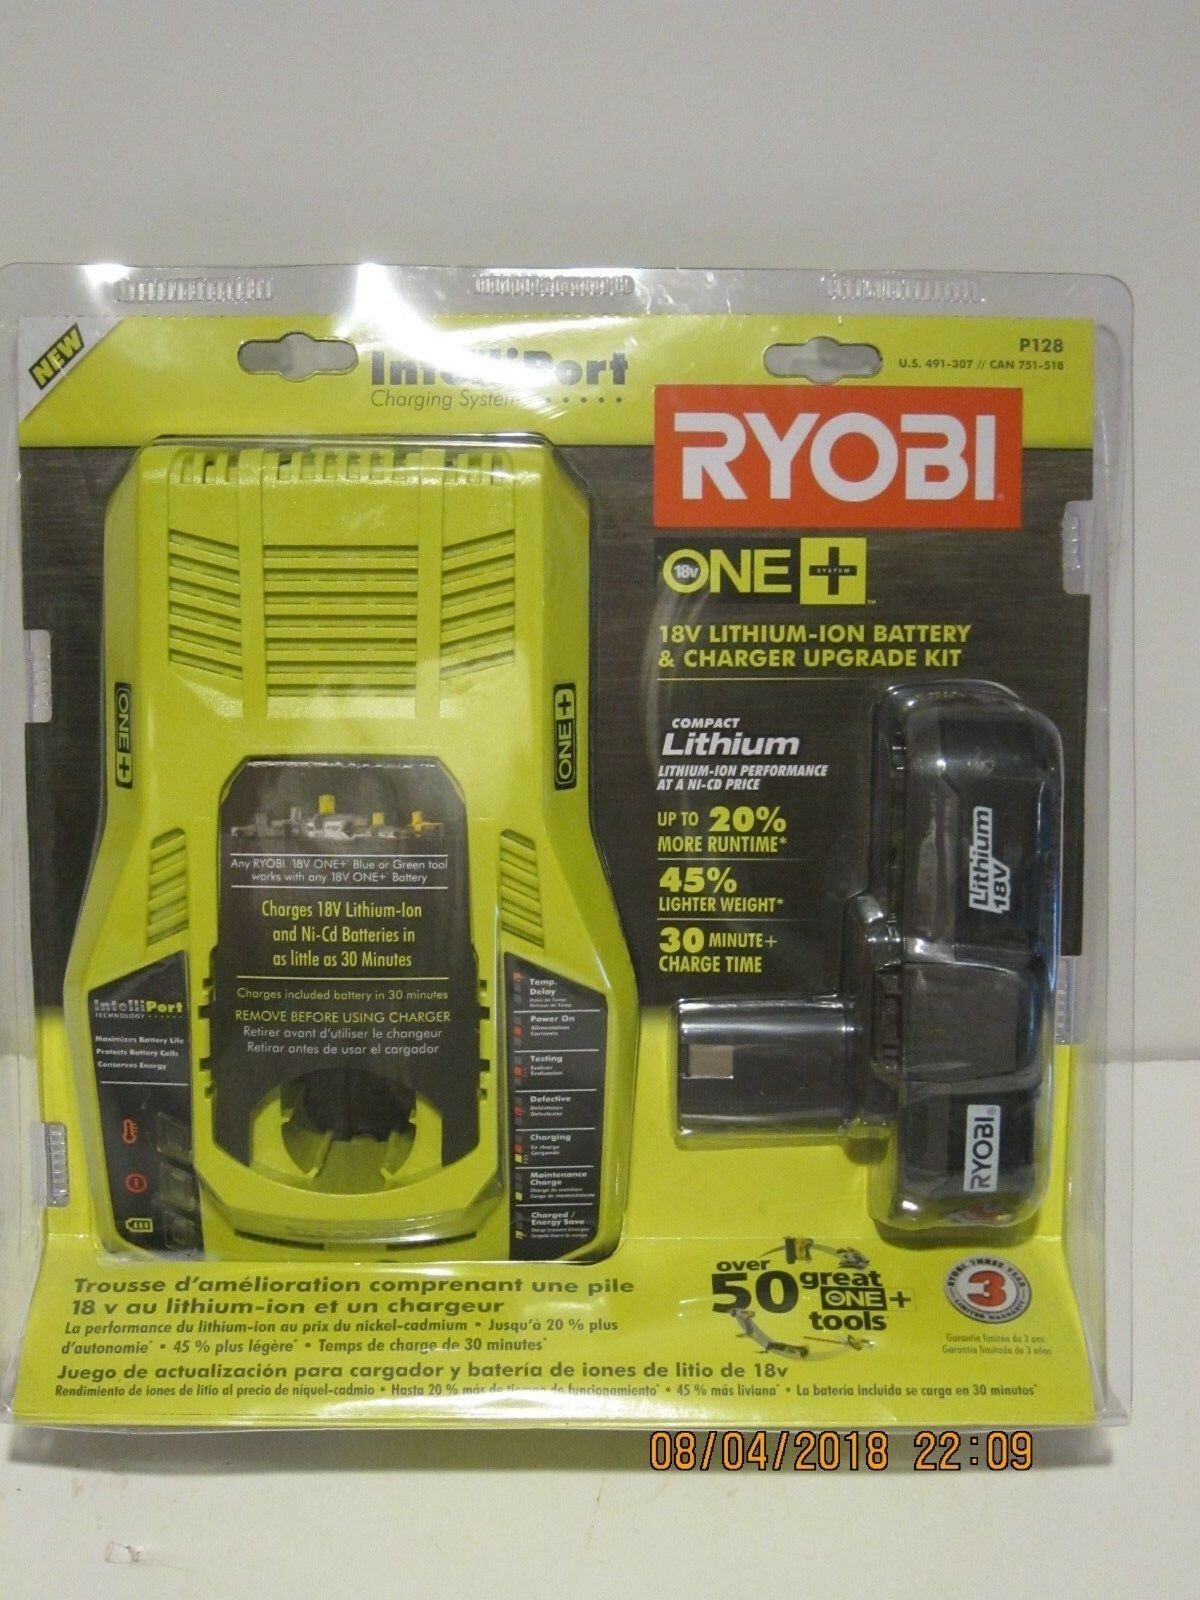 Ryobi P128 18V One+ Intelliport Li-Ion&NiCd Battery&Charger Upgrade Kit NISP FSP